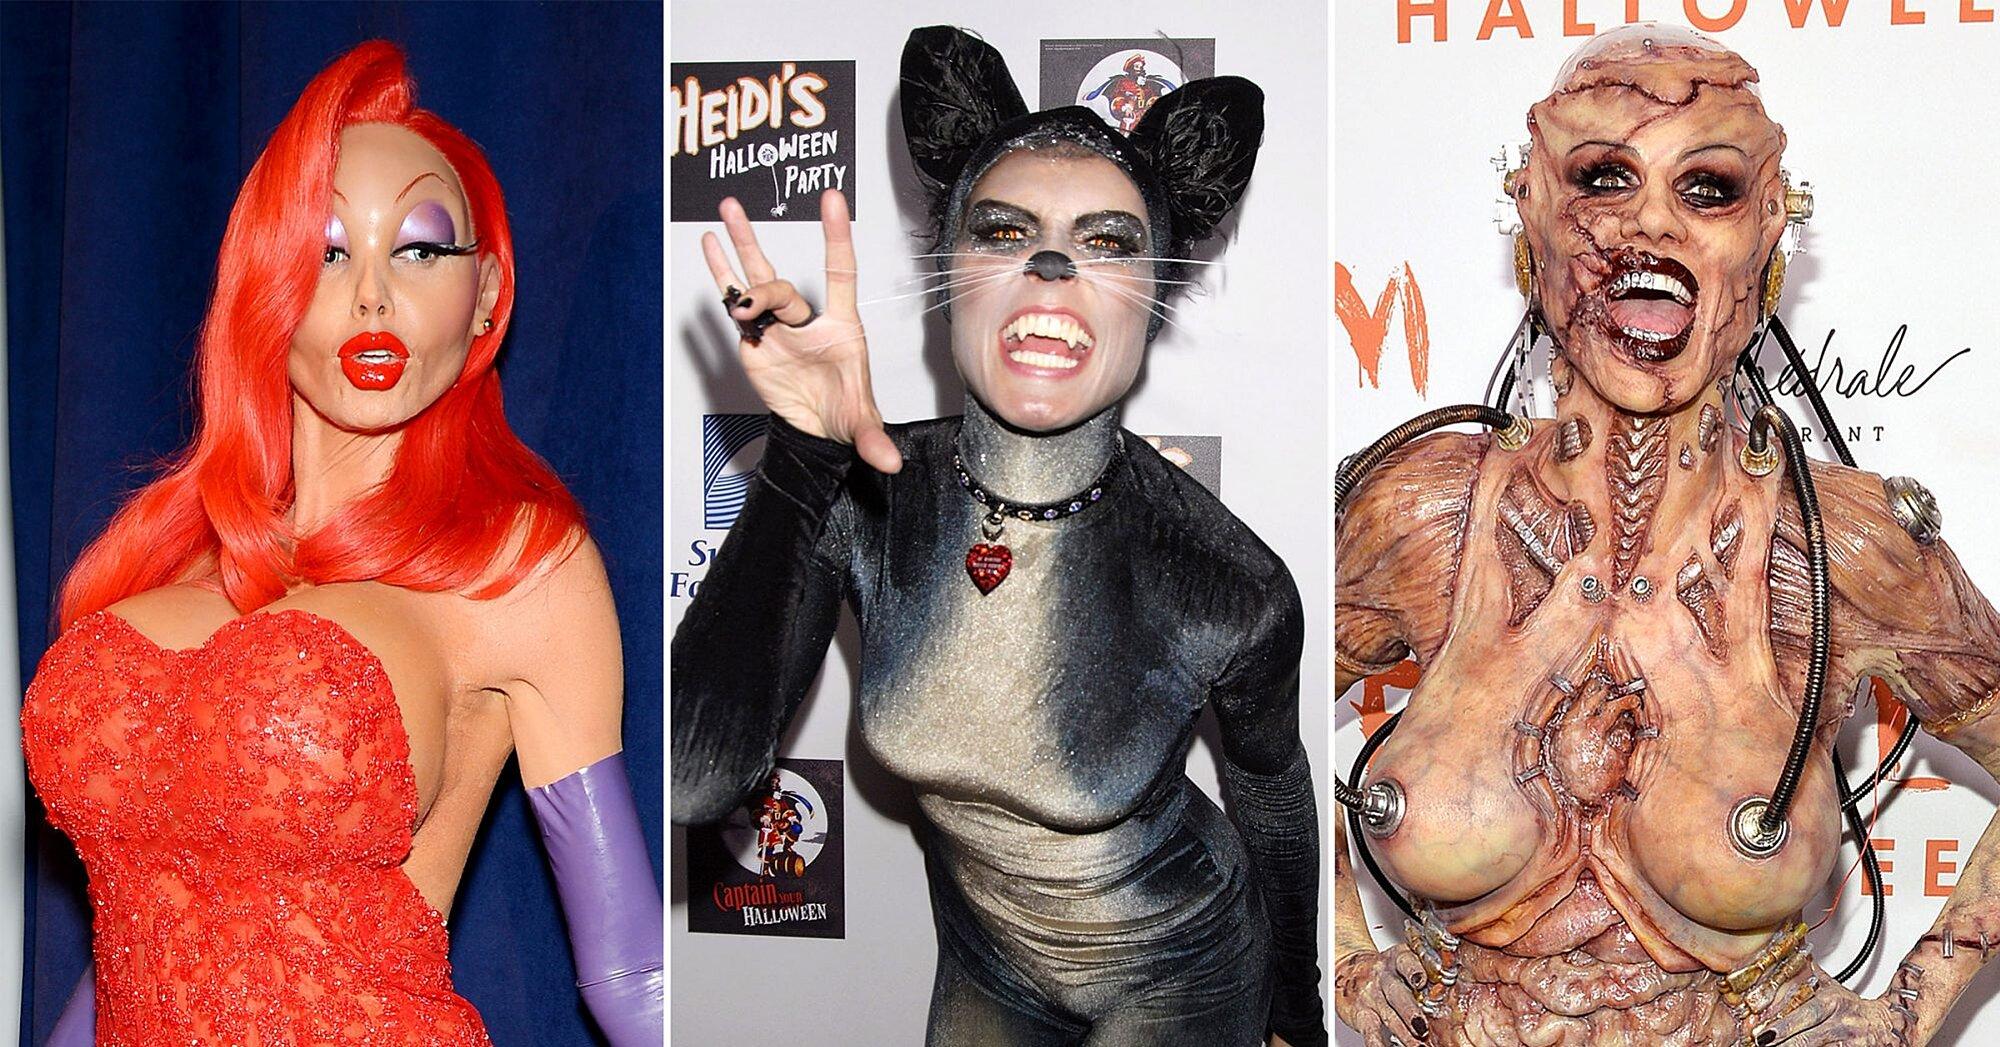 Heidi Klum Halloween Bash 2020.Heidi Klum S Most Epic Halloween Costumes Ew Com